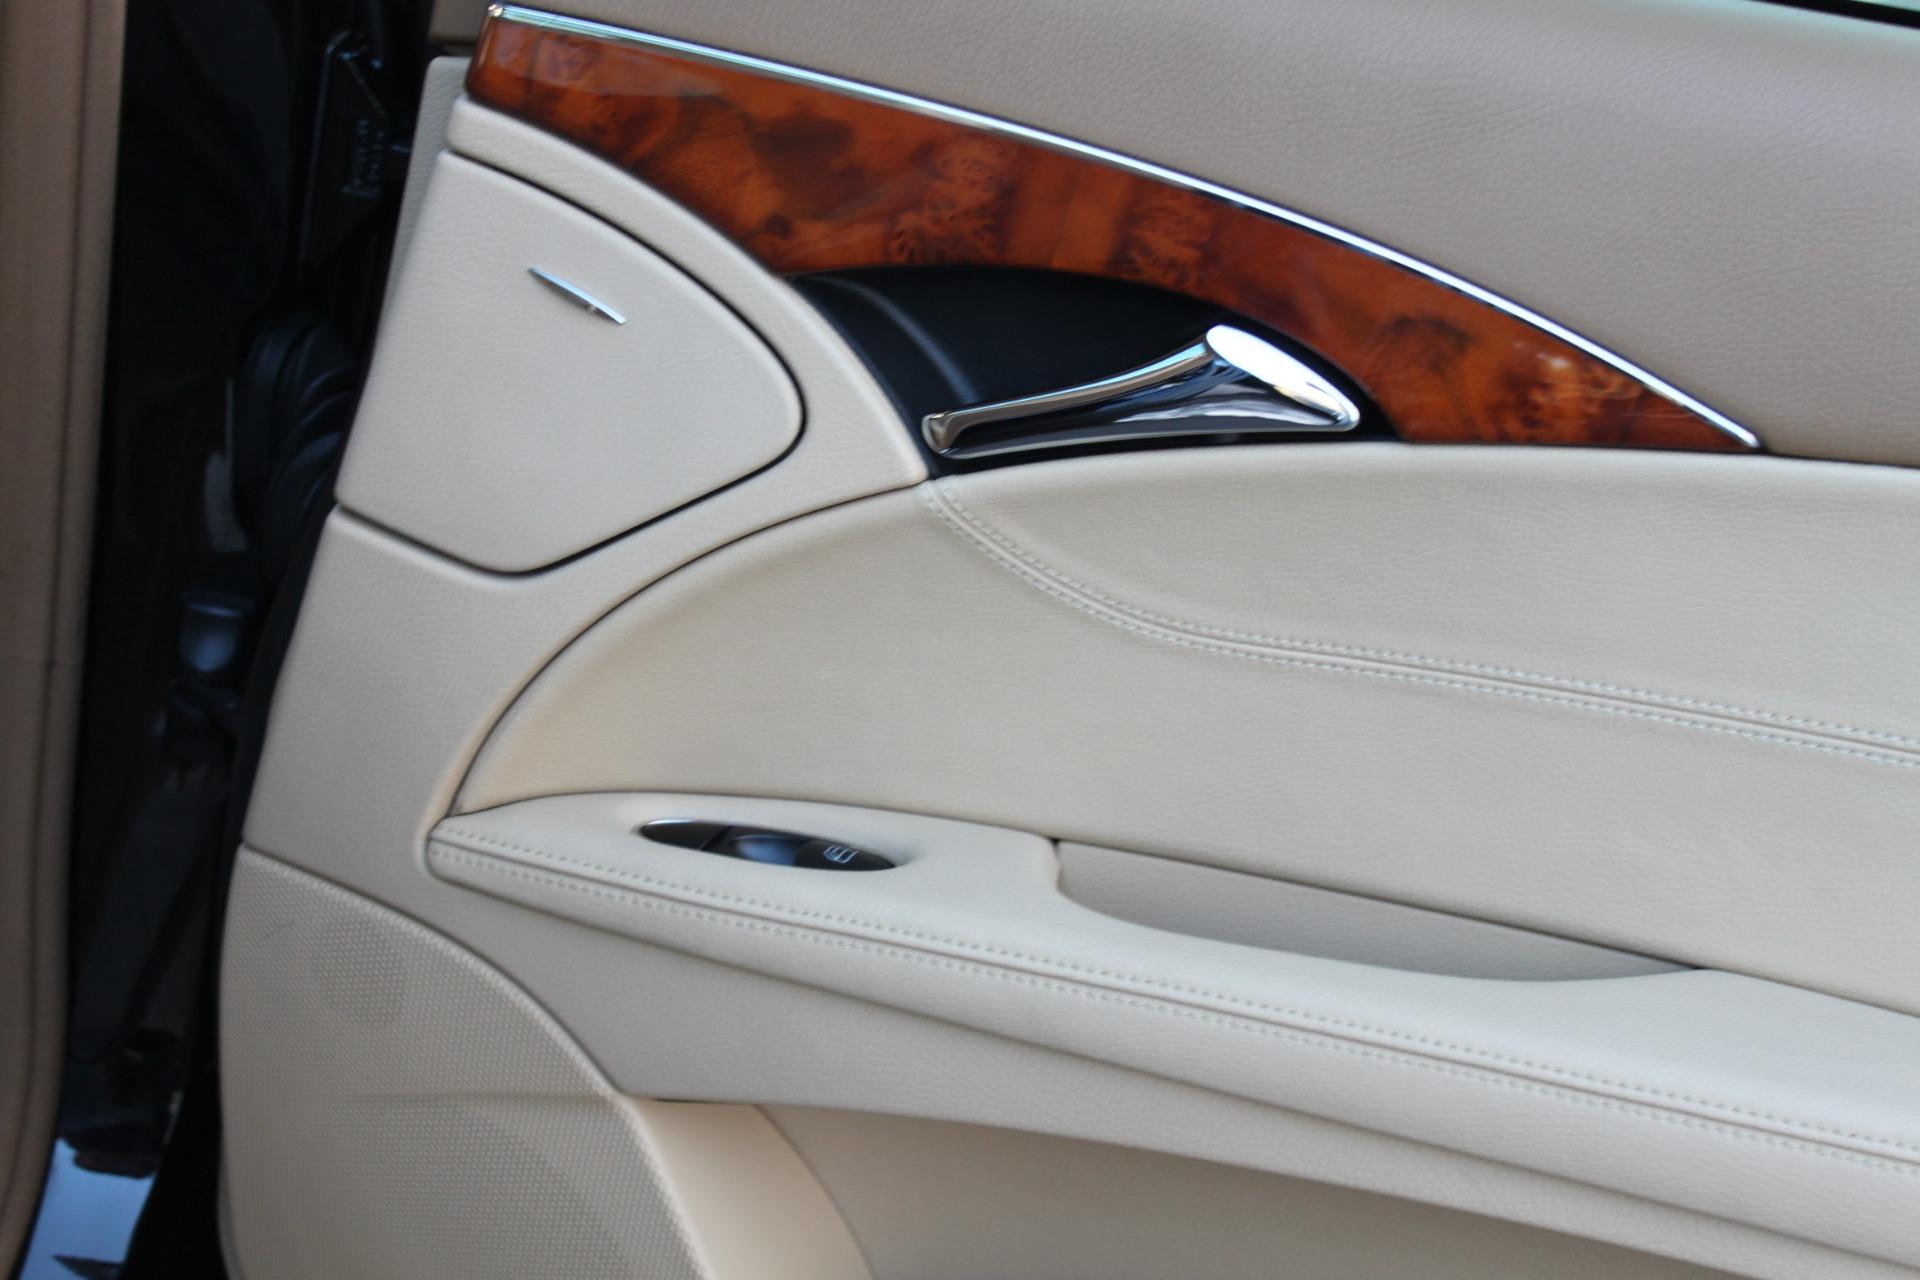 Used-2009-Mercedes-Benz-E-Class-E320-30L-BlueTEC-Dodge